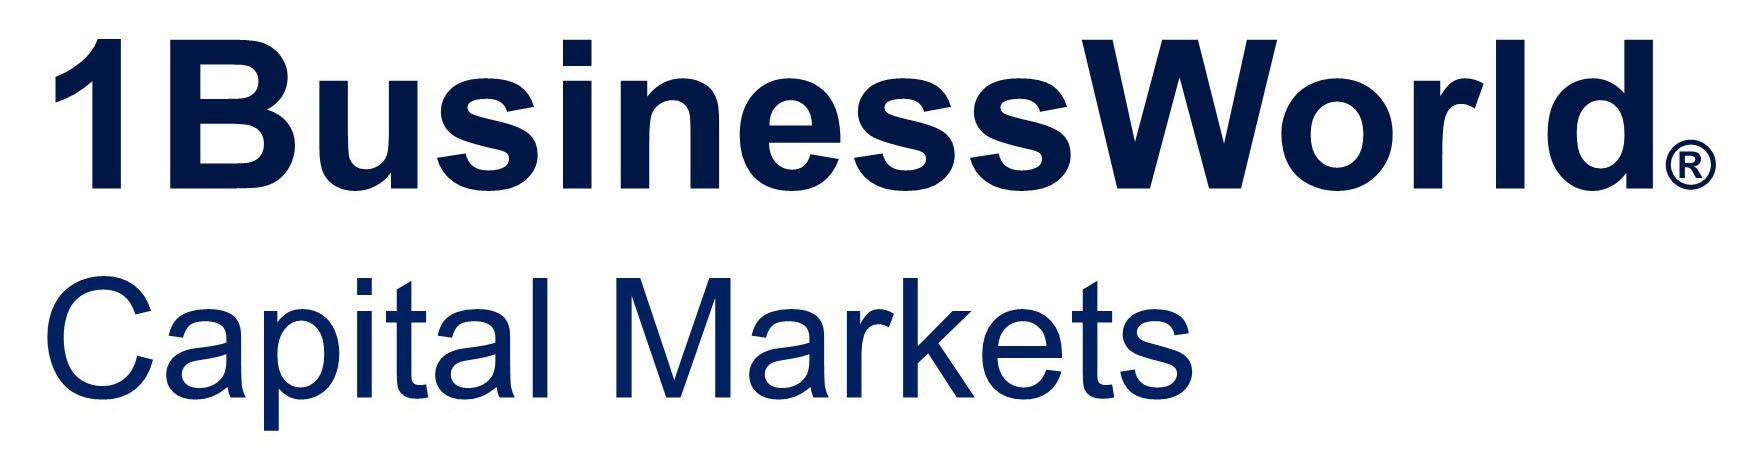 1BusinessWorld Capital Markets